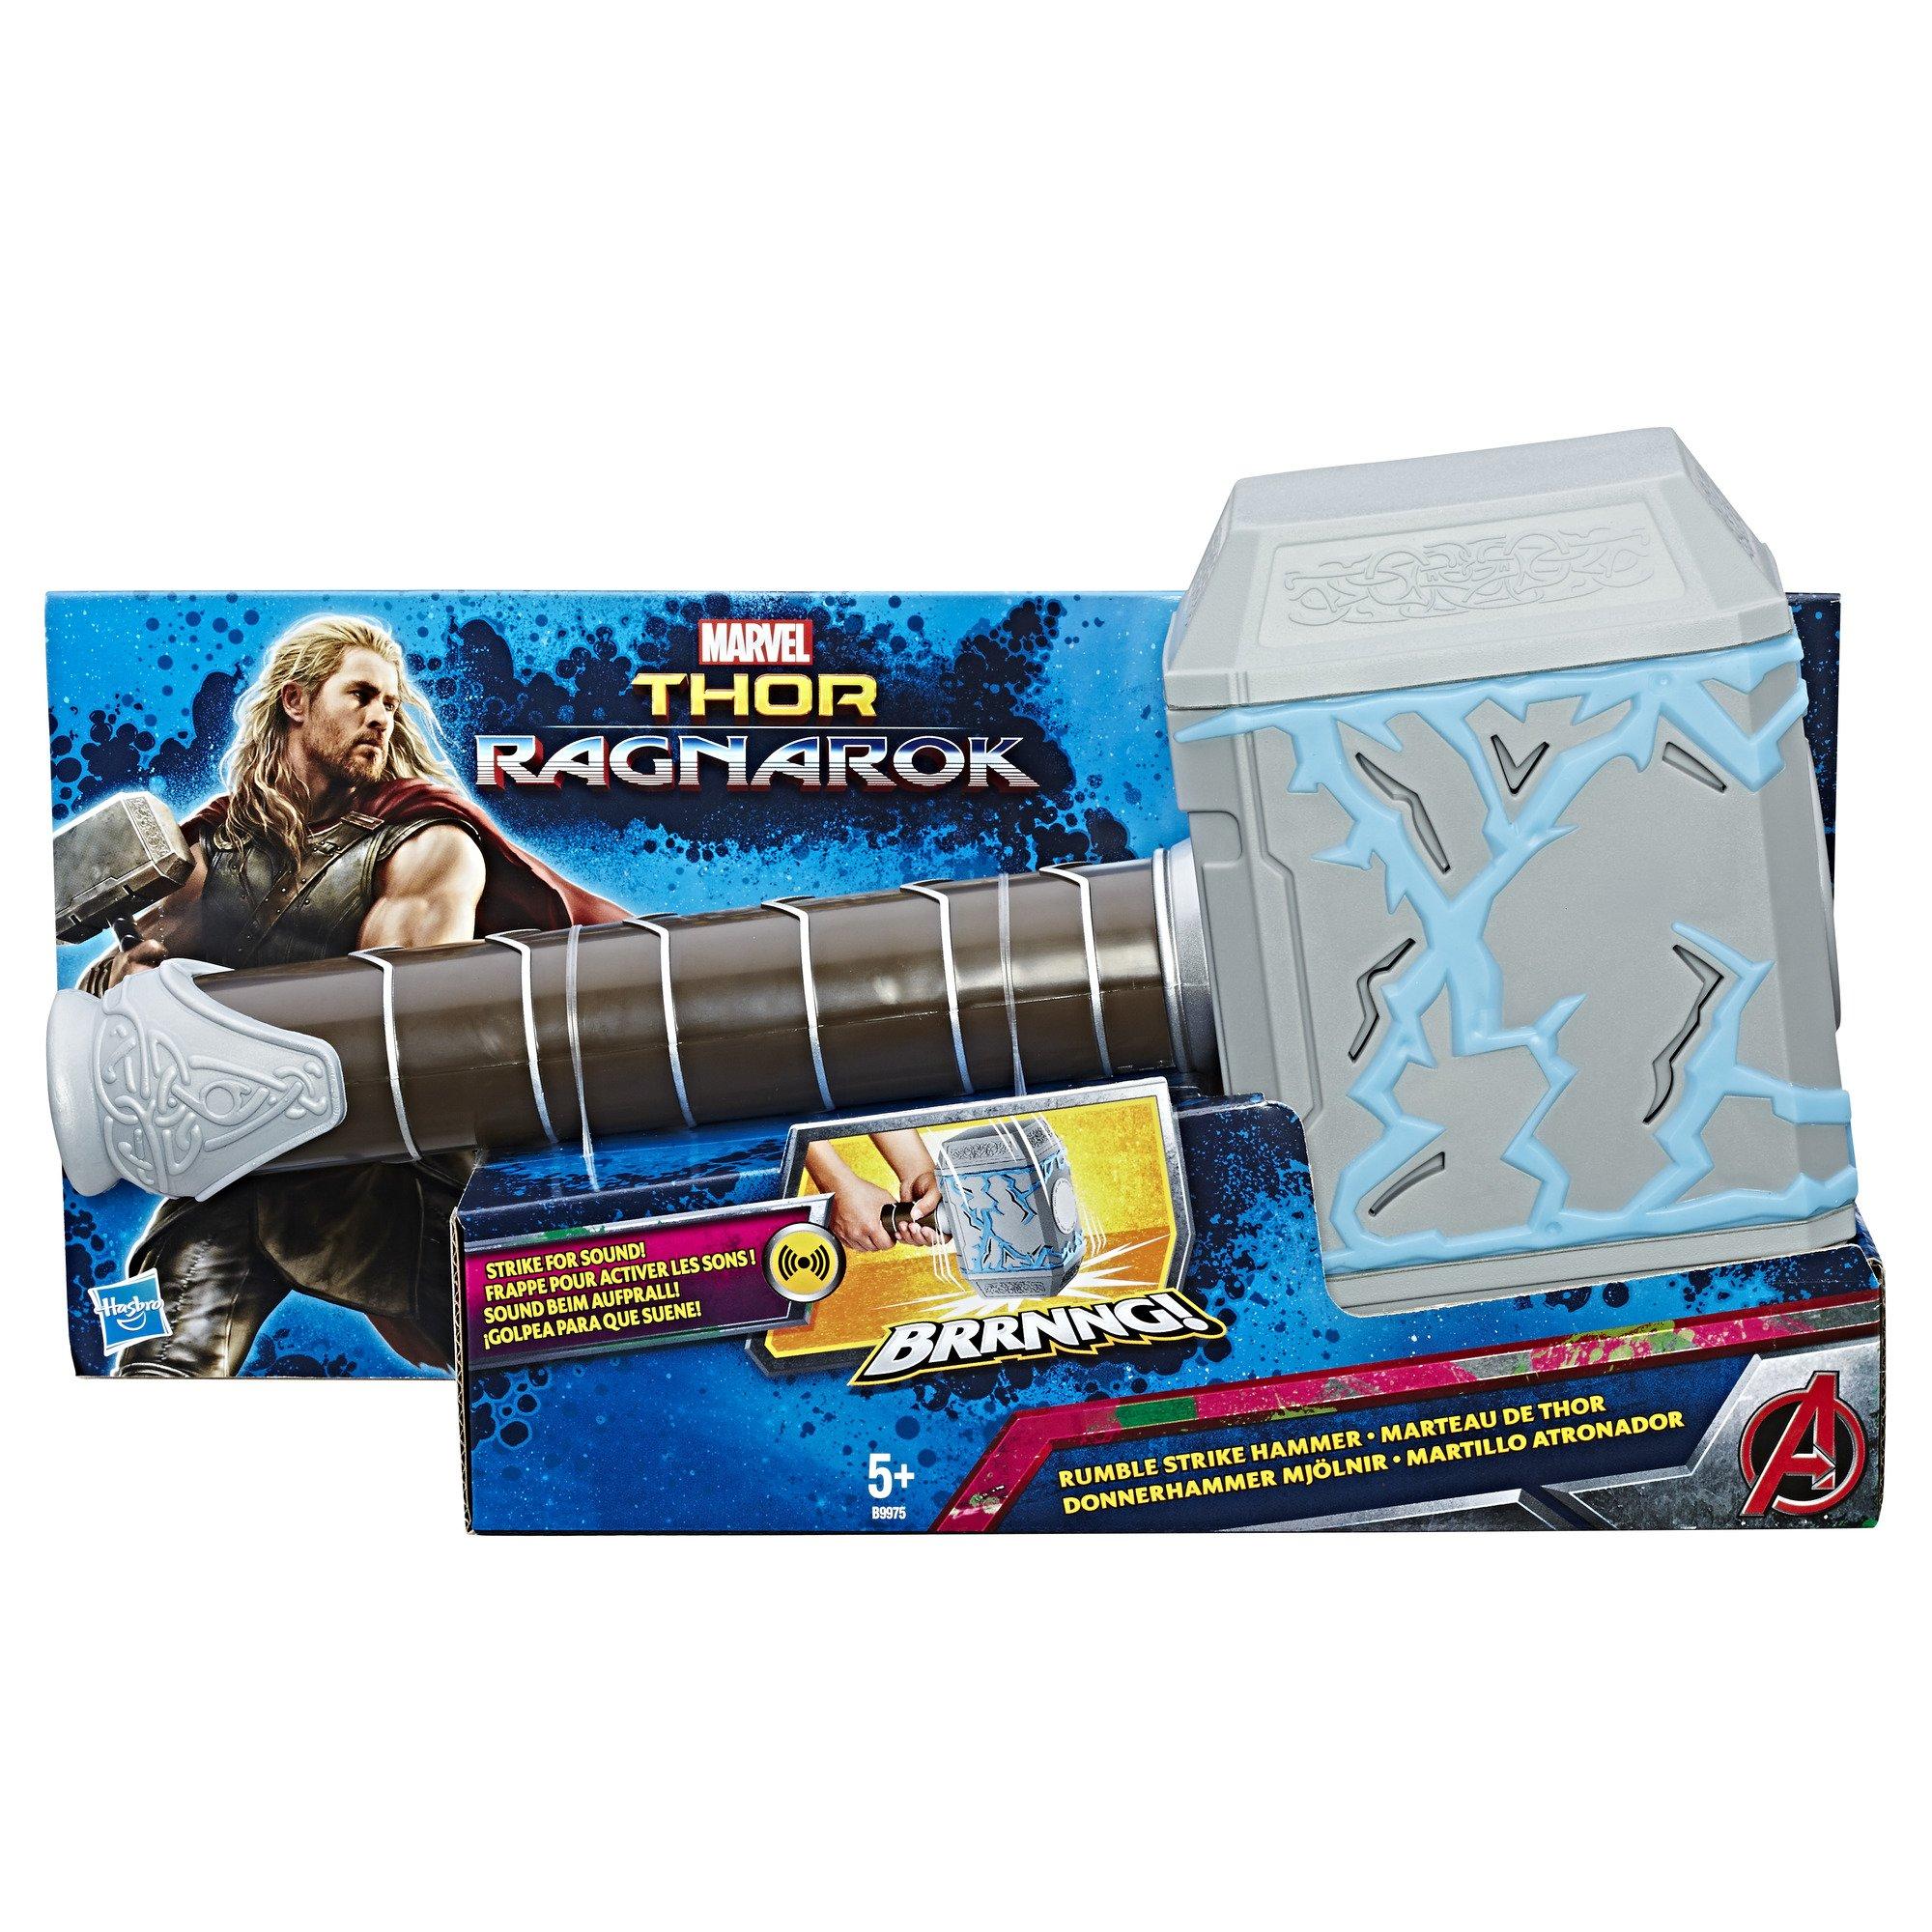 Marvel Avengers Avengers Martillo atronador de Thor,, 34 x 18 cm (Hasbro B9975EU4) product image